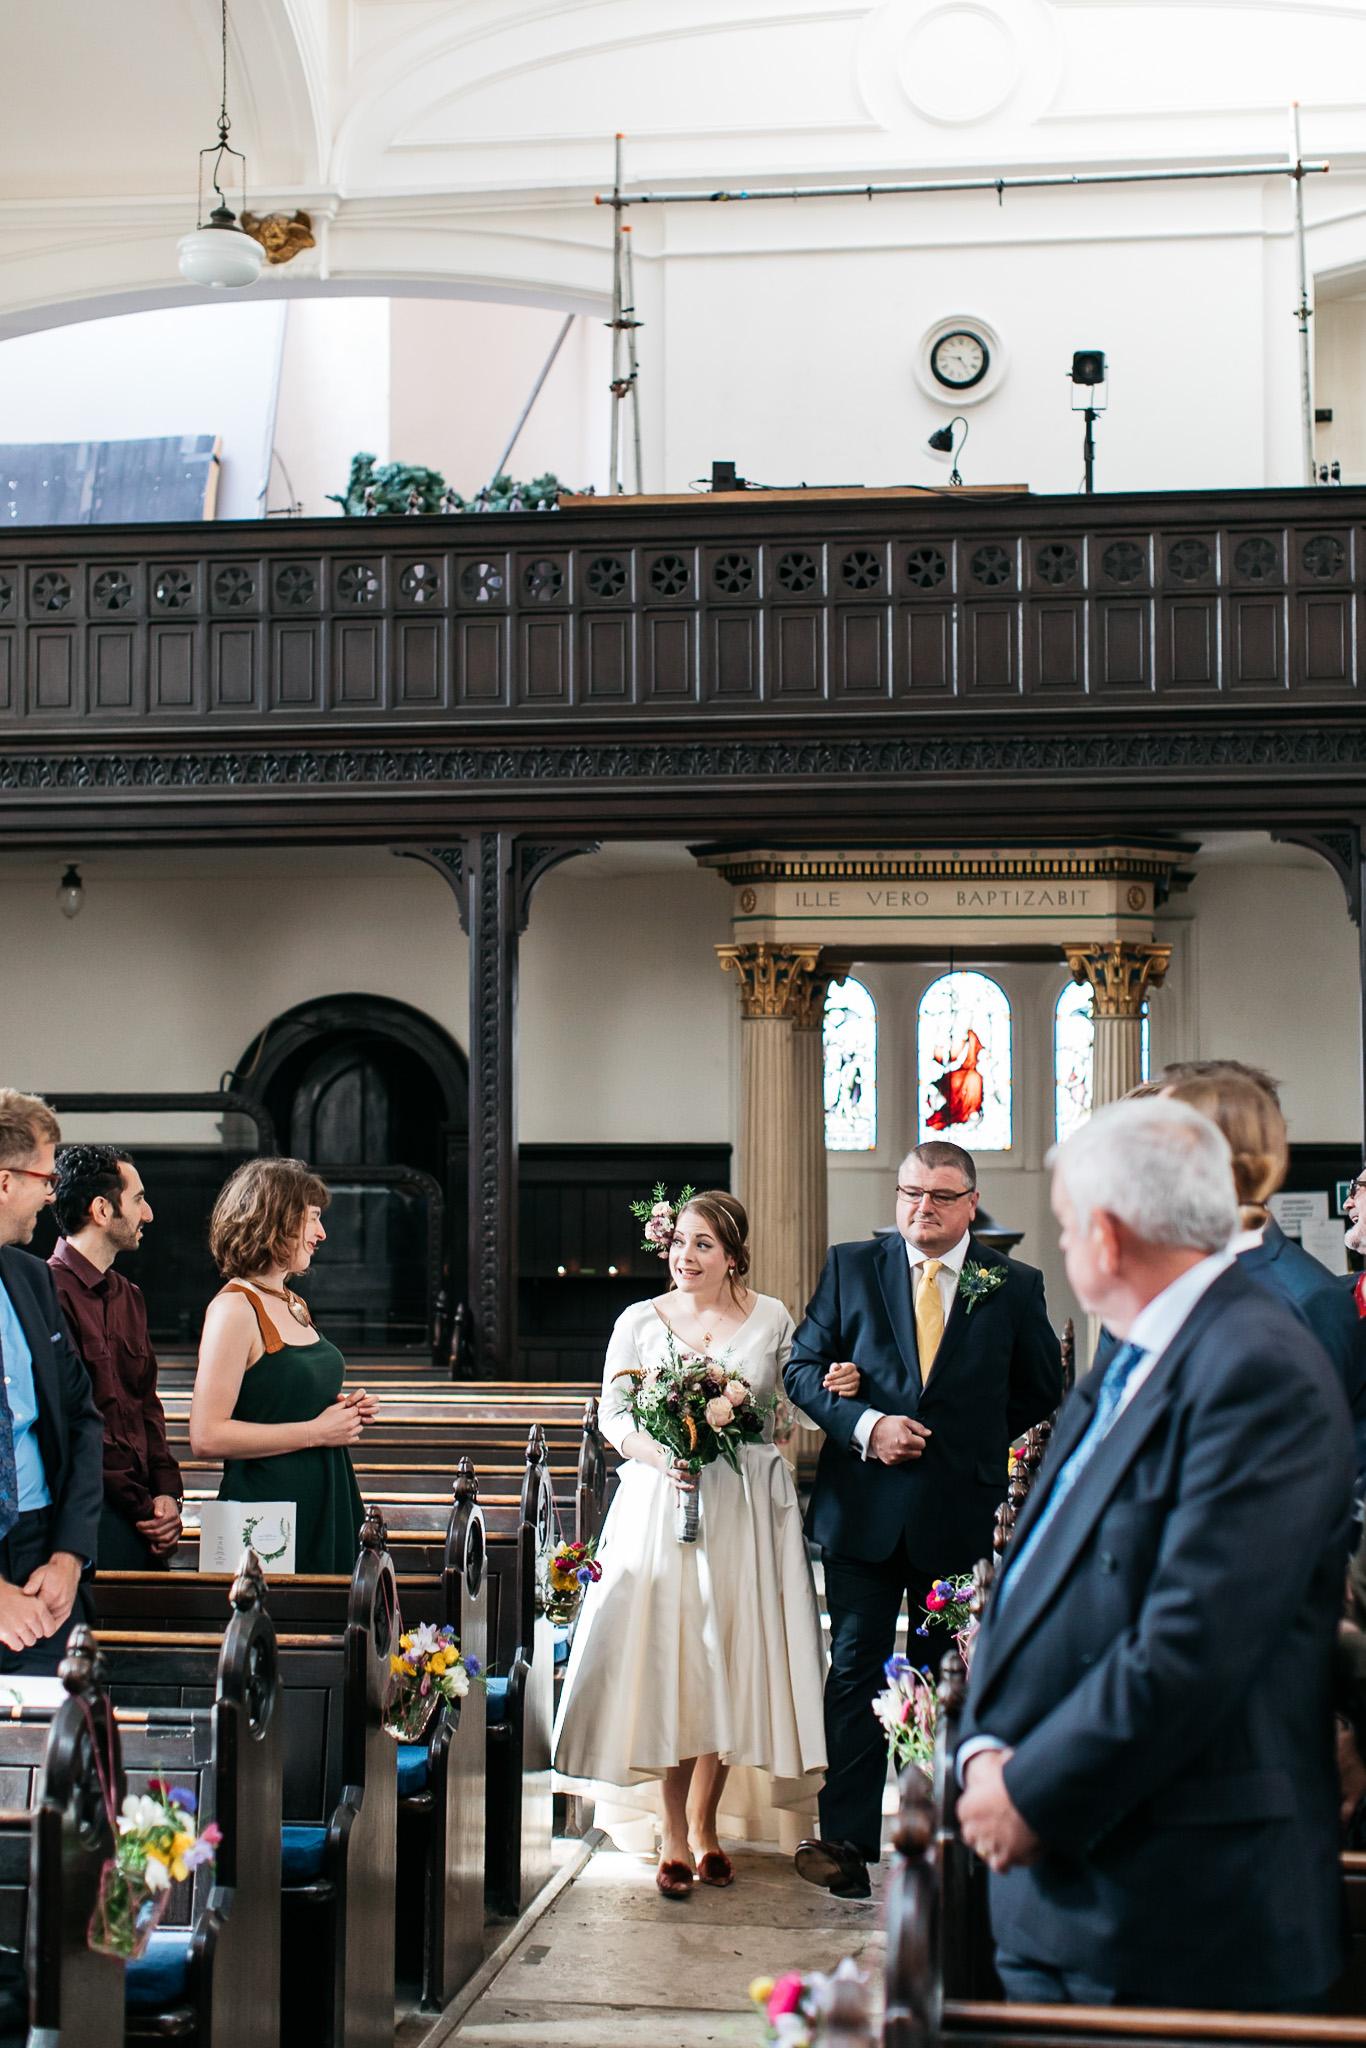 st_andrews_fabrica_brighton_wedding_550.jpg